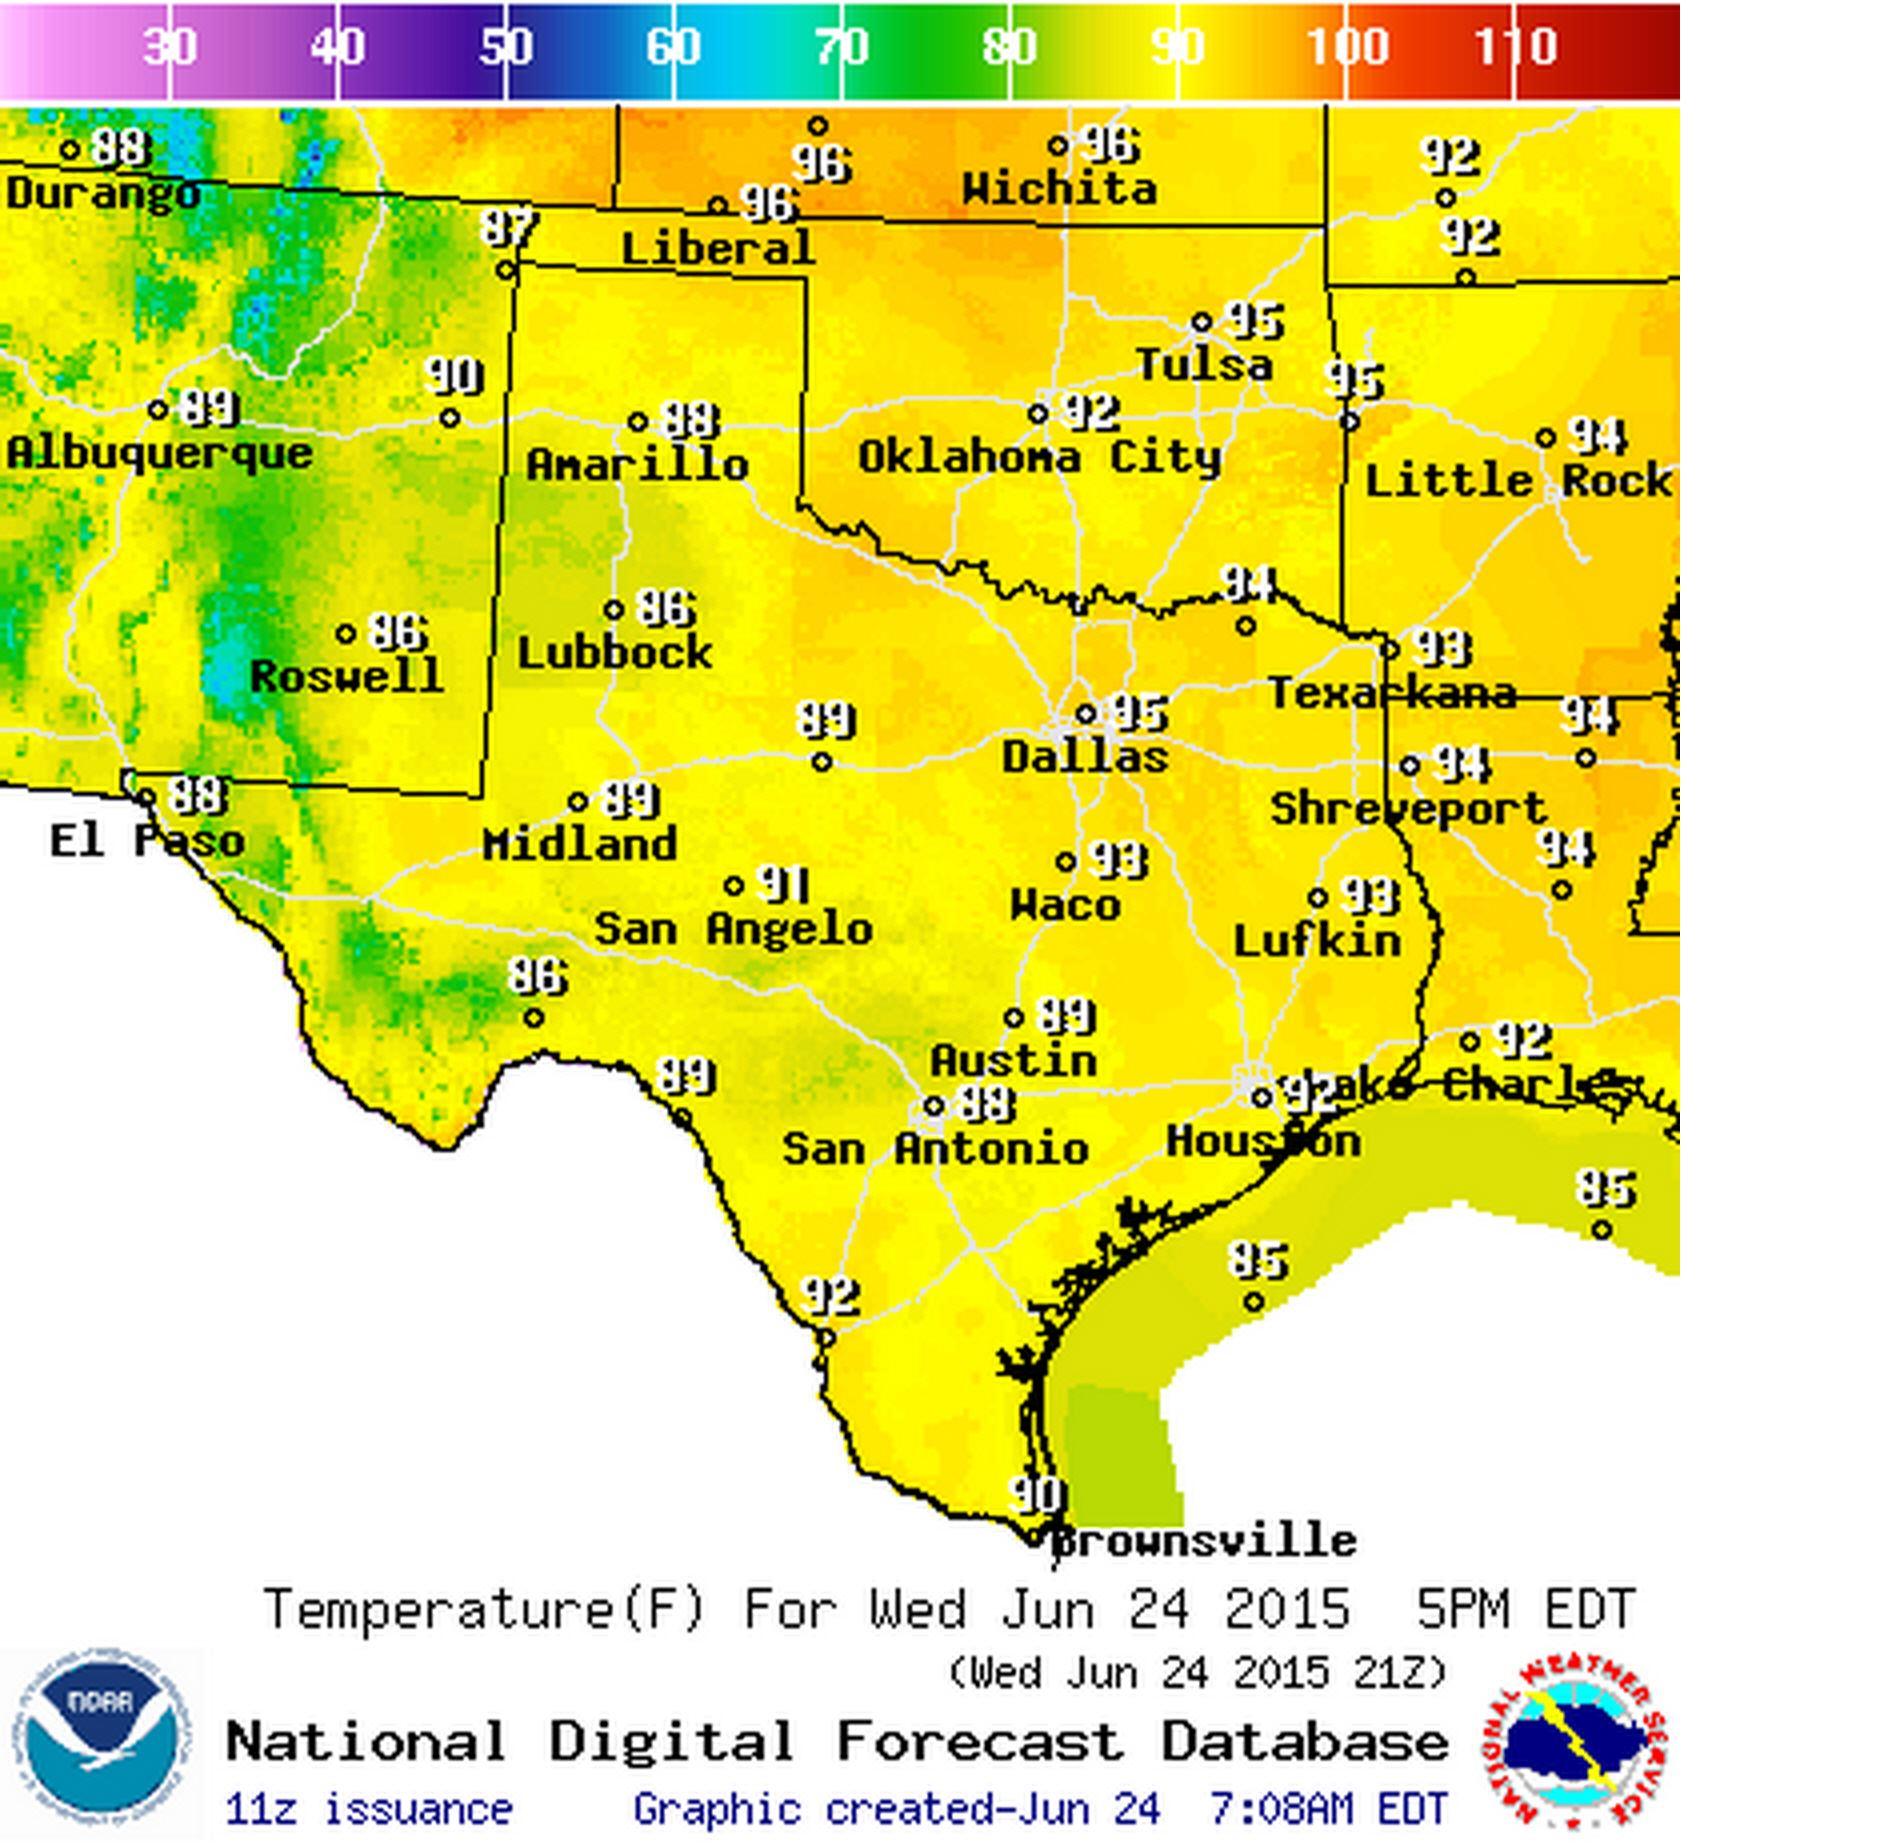 Wednesday's High Temperature Forecast